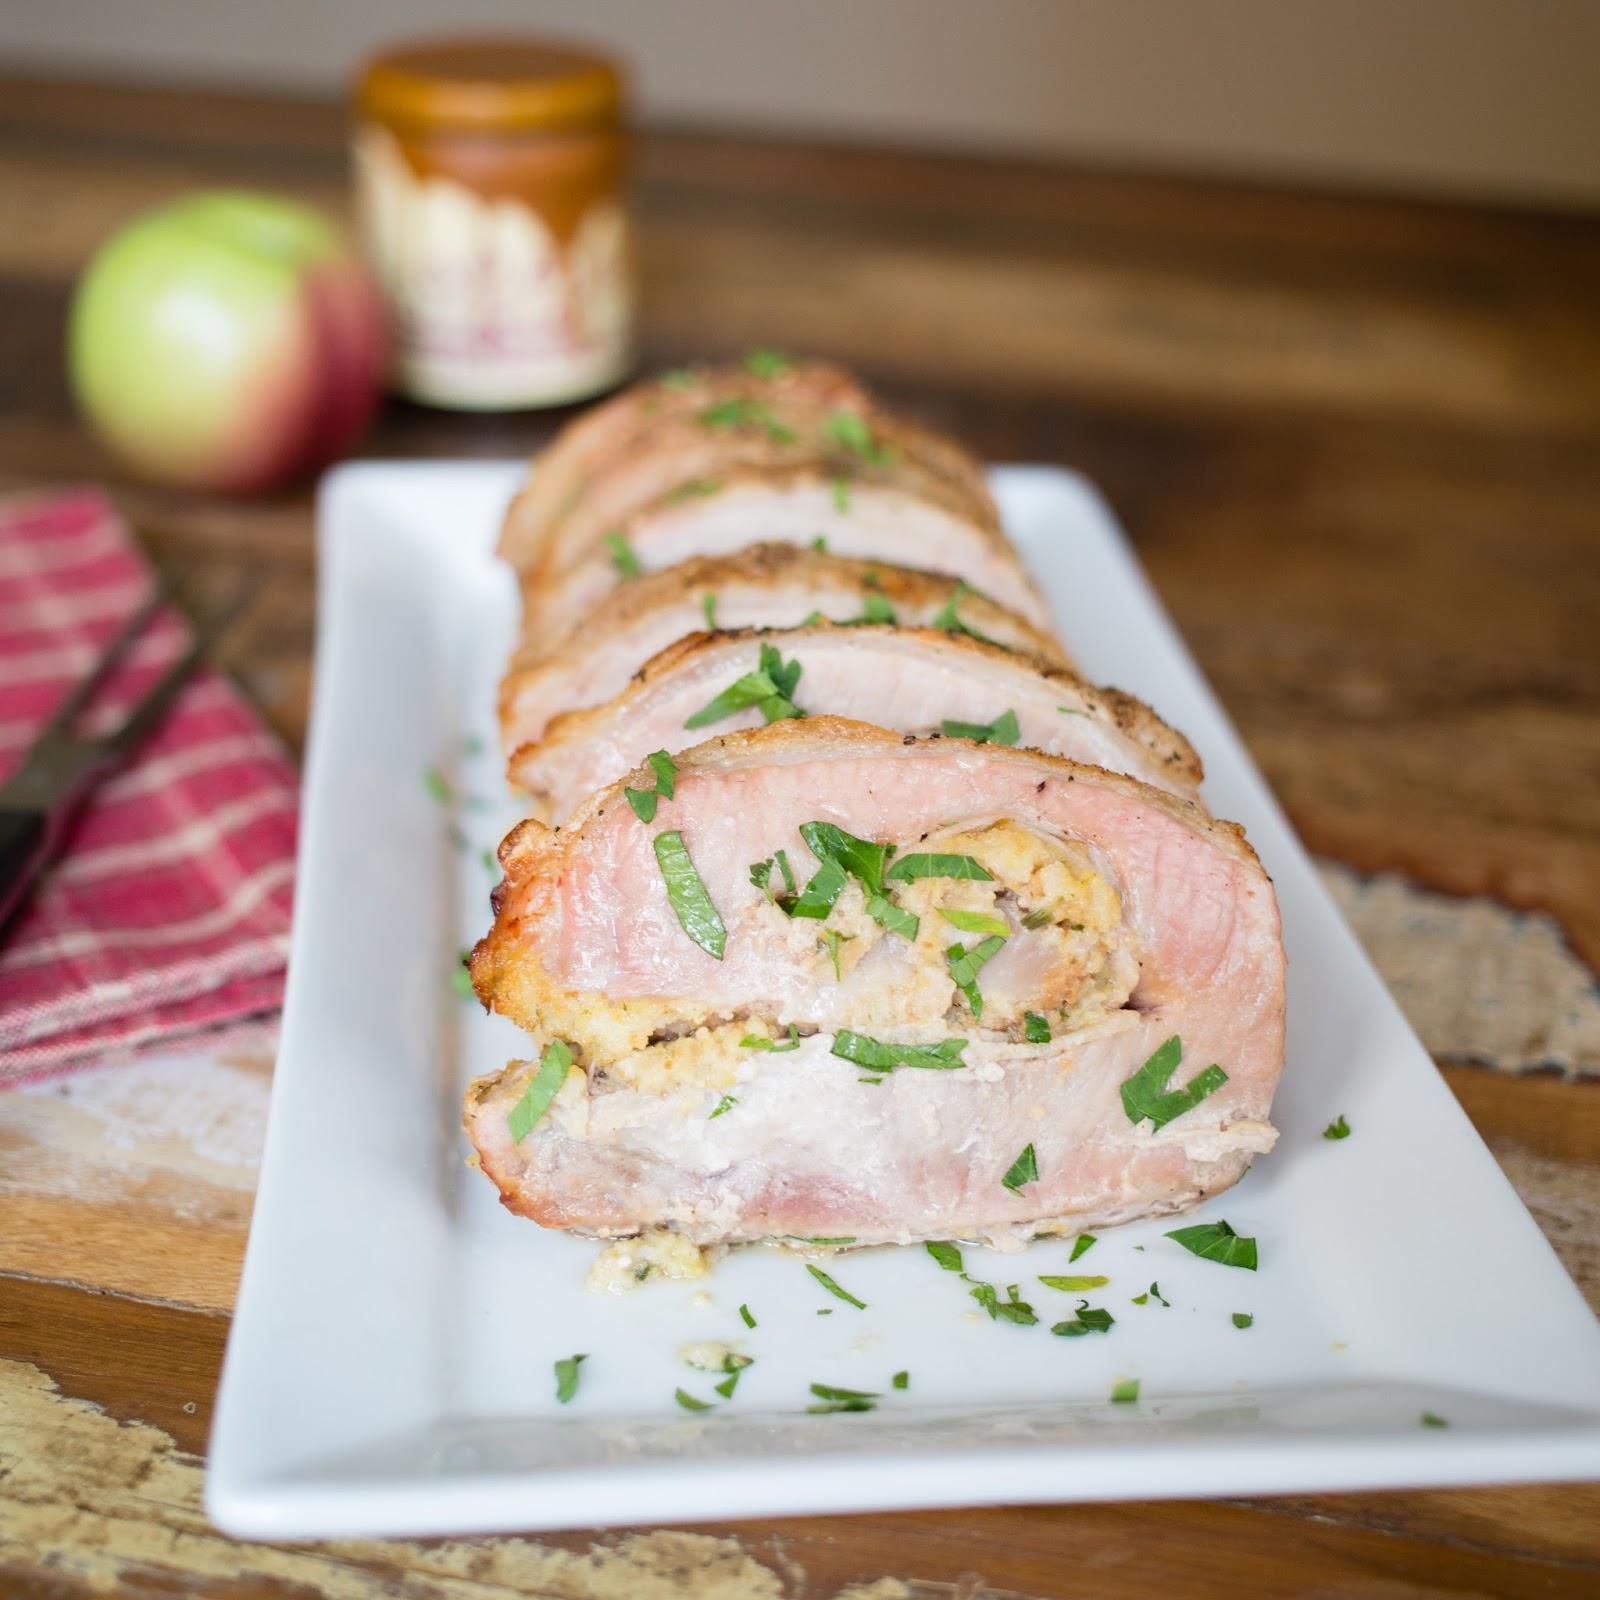 is for: Avon Prime Meats & Apple, Caramel Cornbread Stuffed Pork